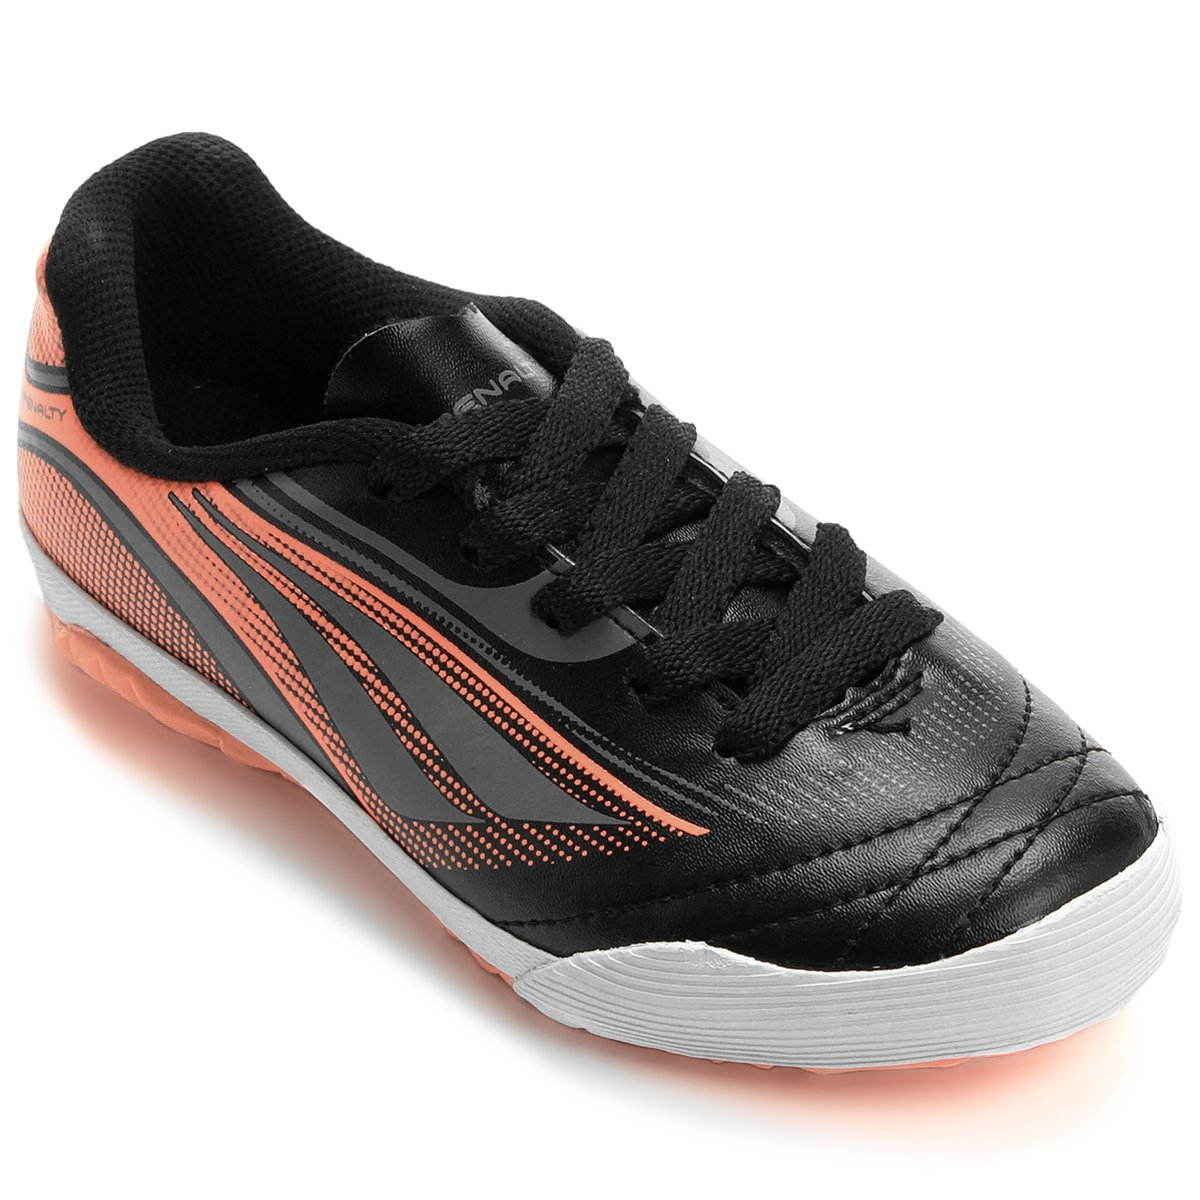 Chuteira Futsal Infantil Penalty ATF Rocket 6 - Compre Agora  19f4e87831323